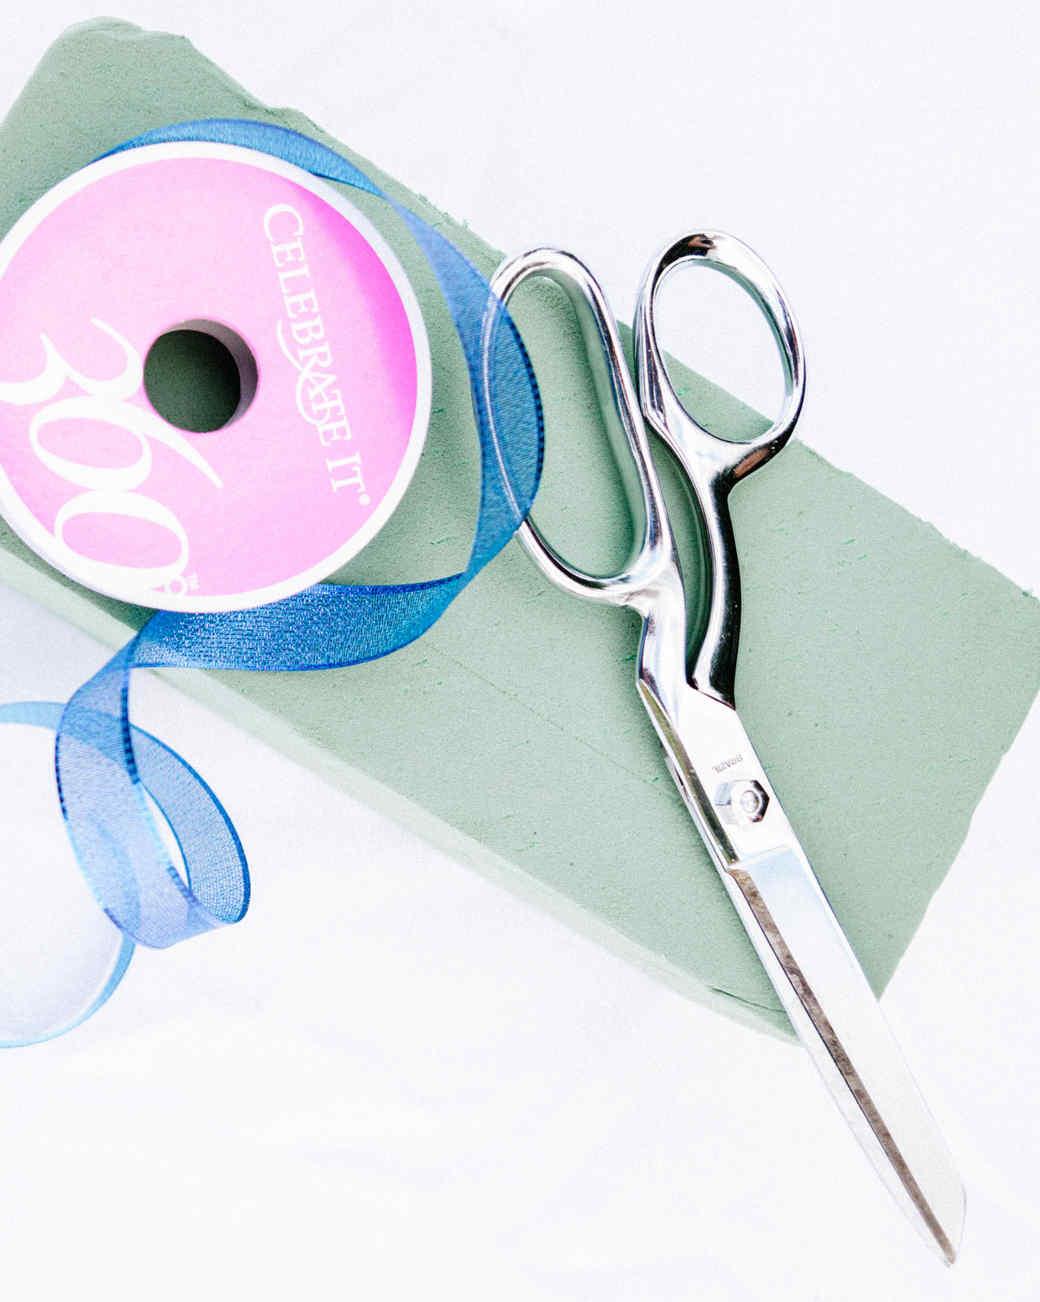 Scissors, ribbon and foam